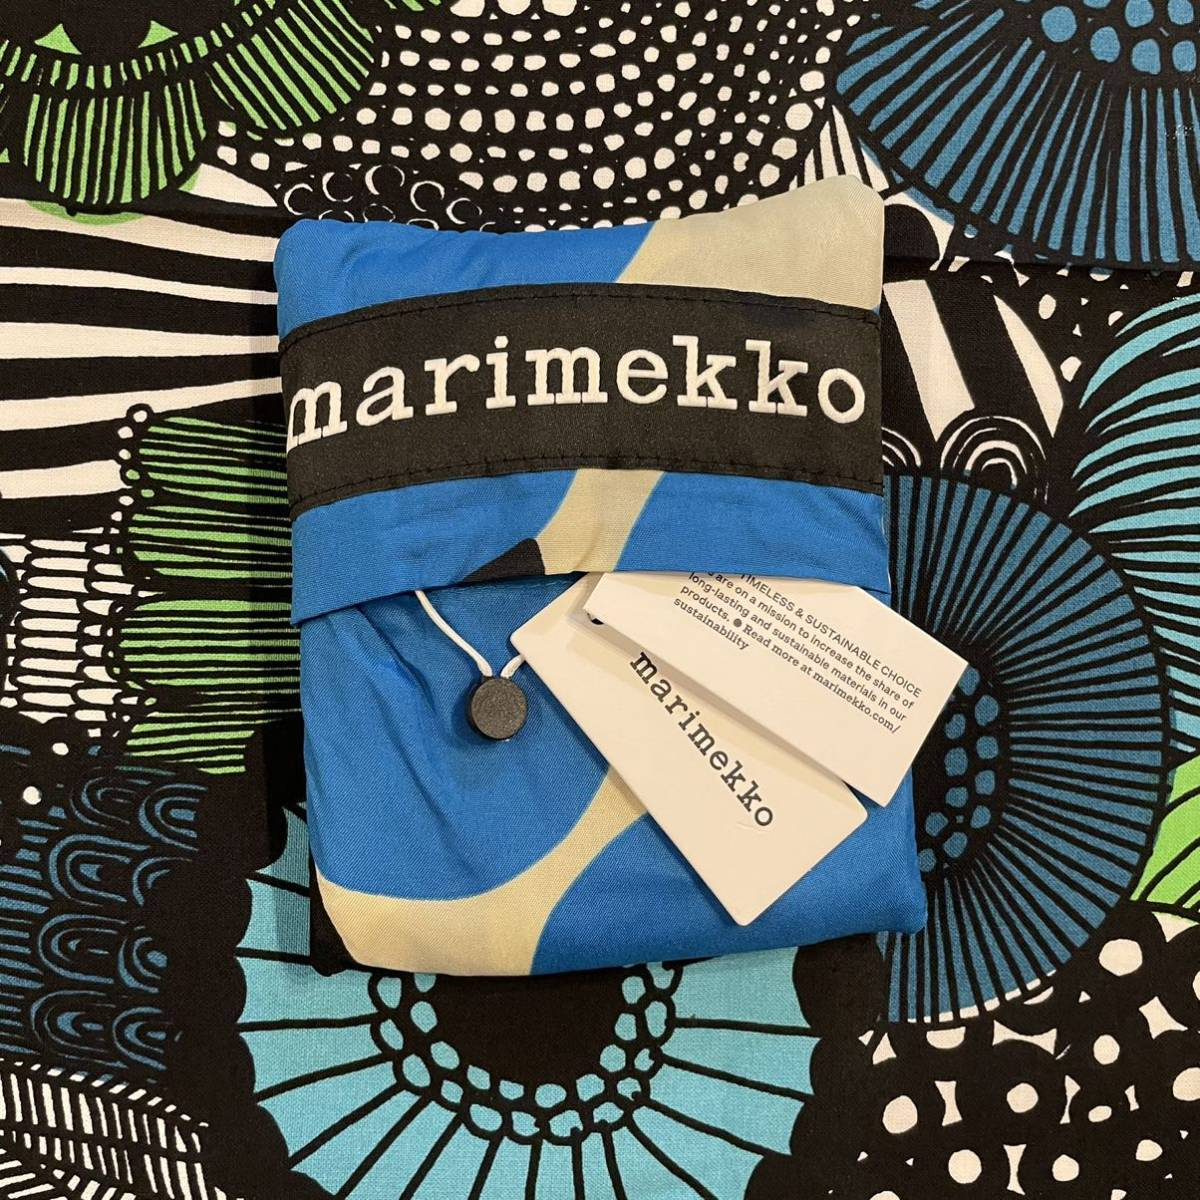 marimekko マリメッコ 新作UNIKKOエコバッグ+定番トートバッグ